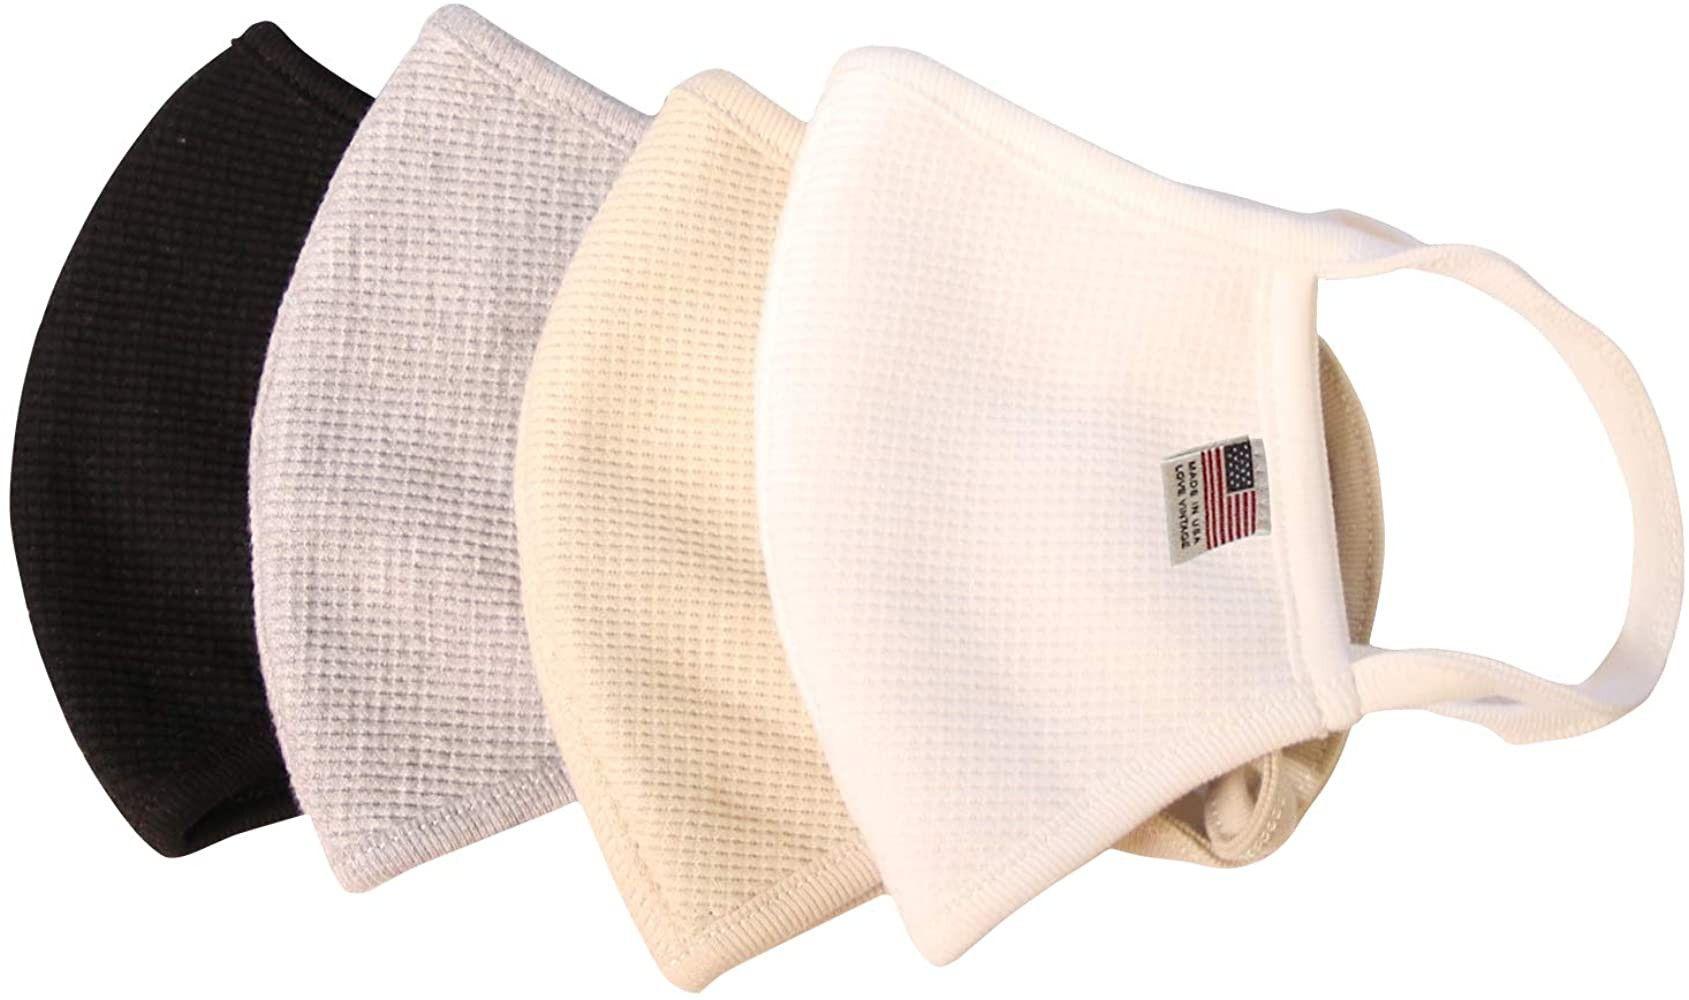 Facemask   La california, Cotton material, Cotton